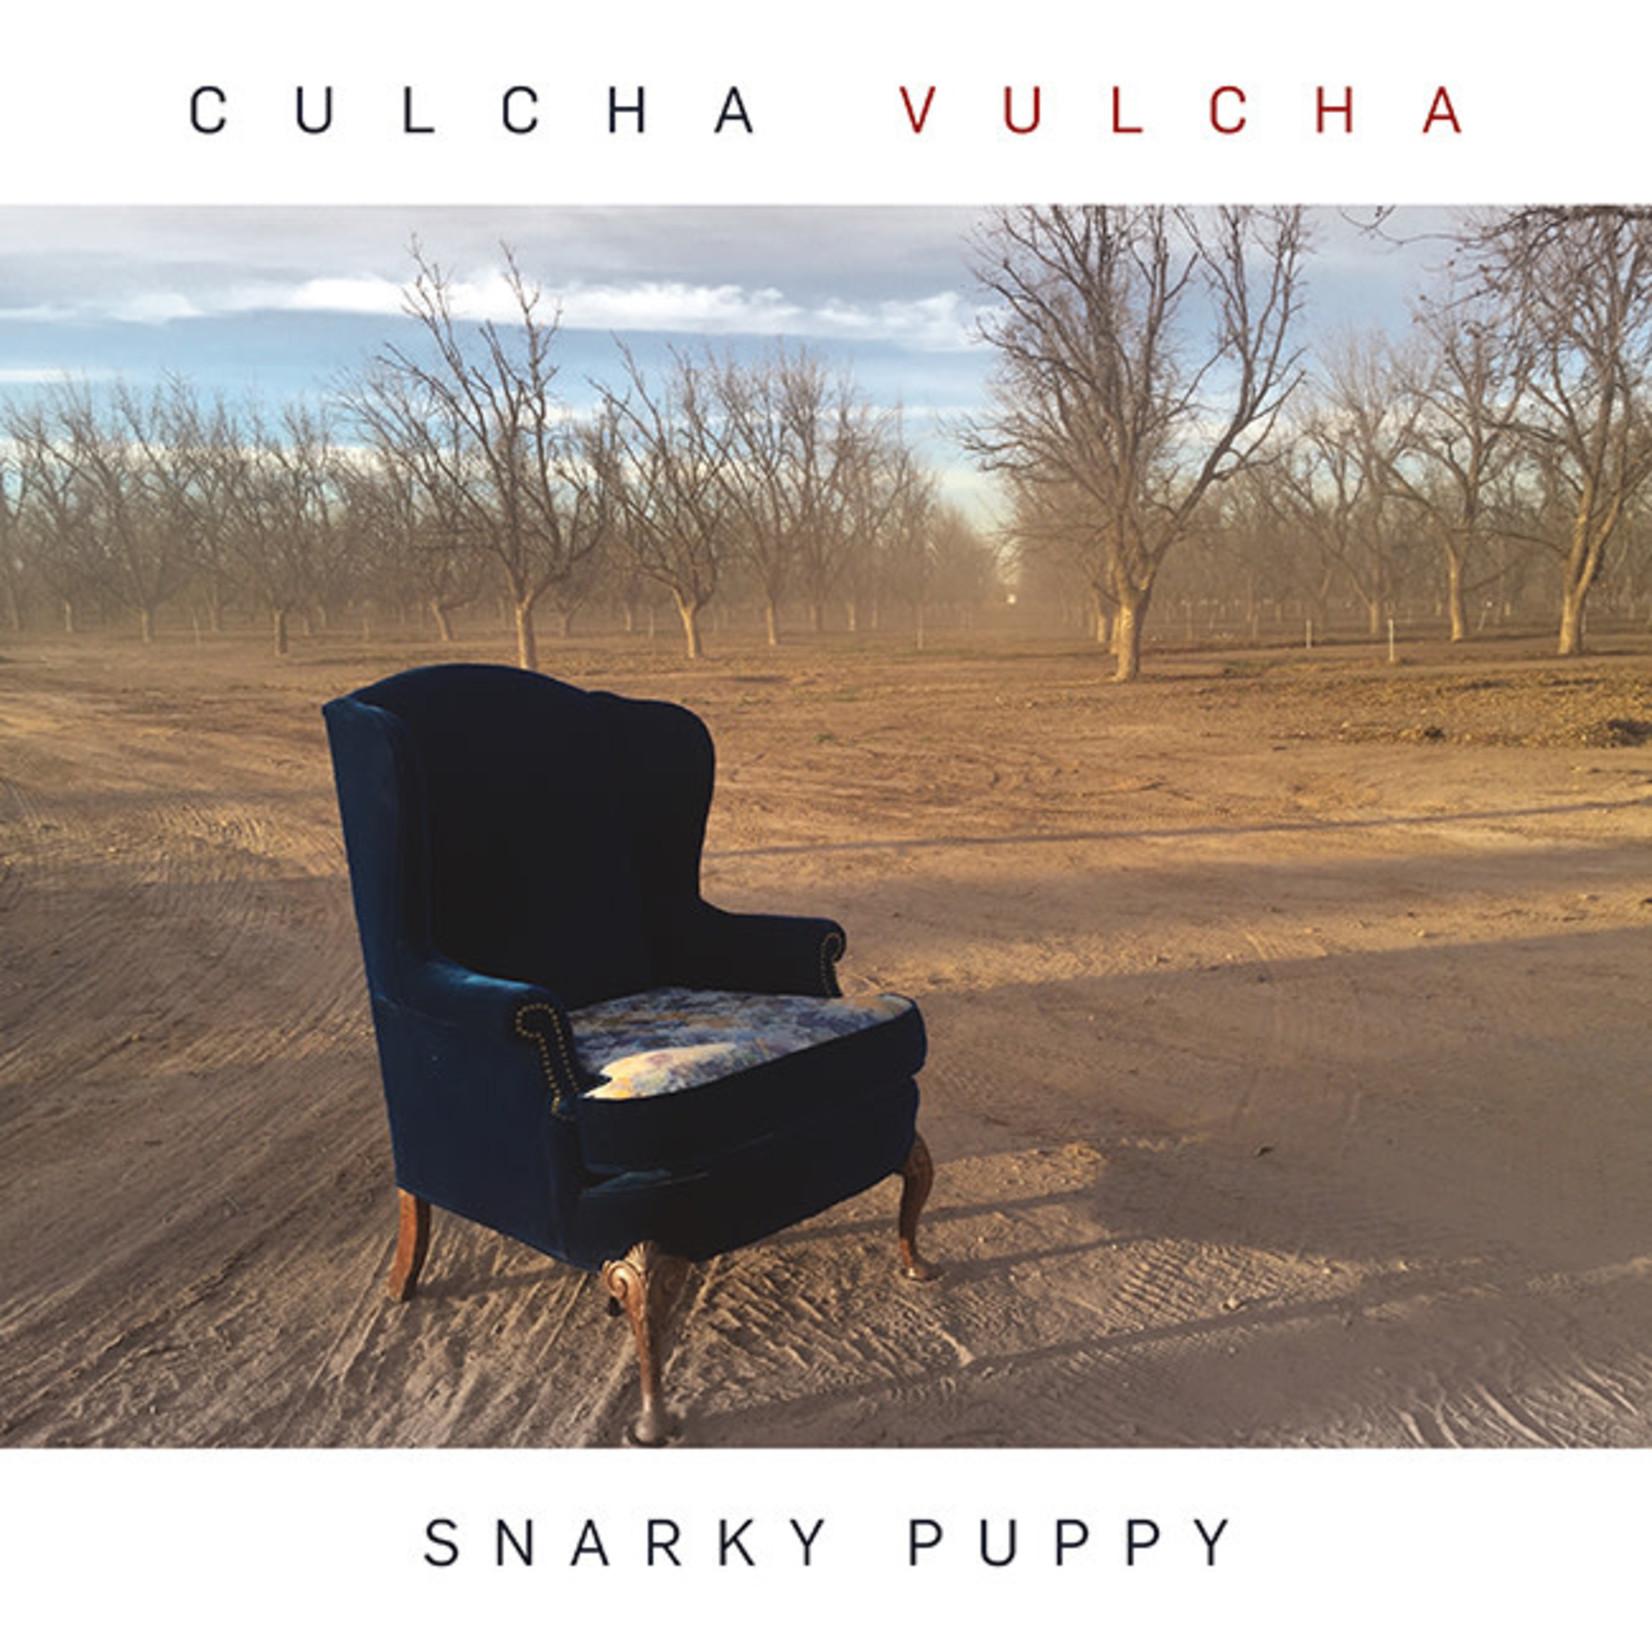 [New] Snarky Puppy: Culcha Vulcha (2LP)